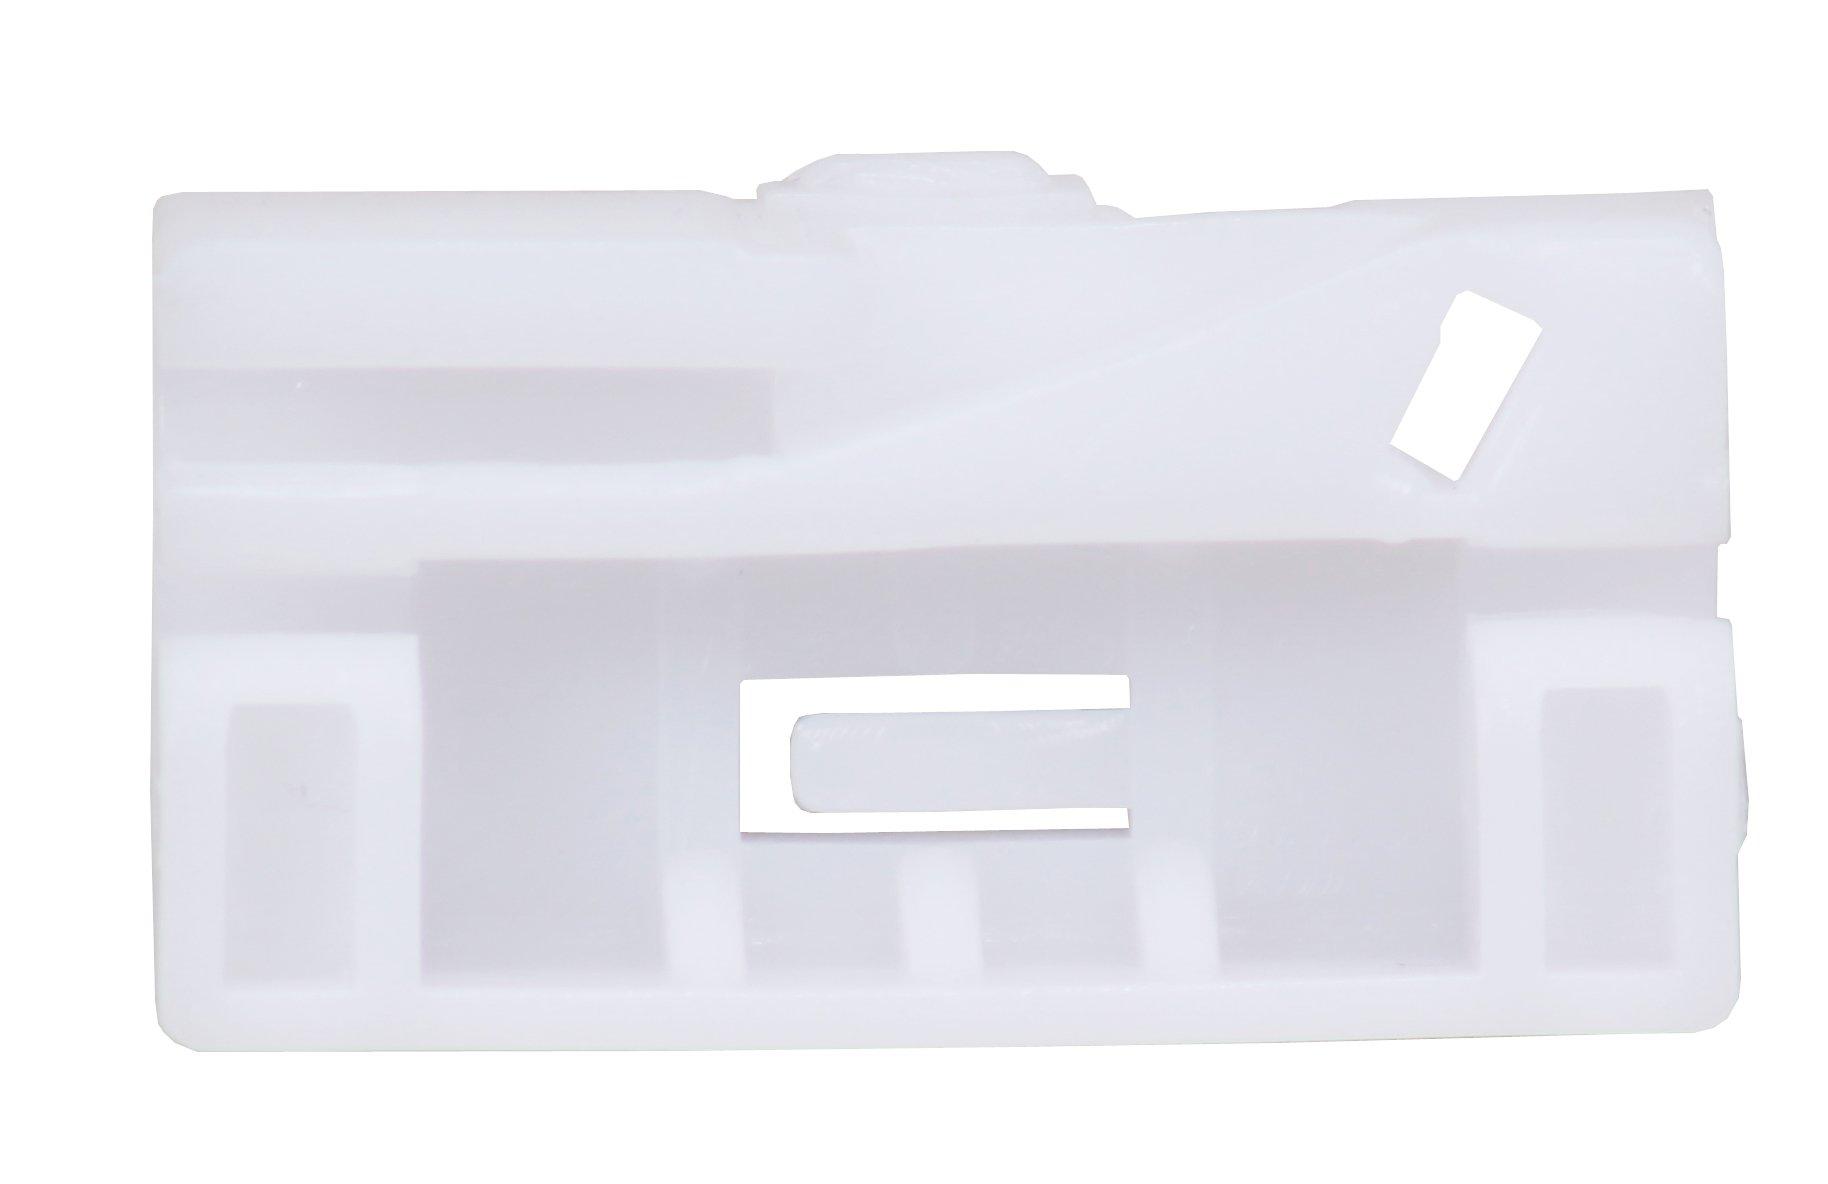 Fydun 2pcs Car Window Switch Button Cap Covers Window Regulator Covers for Vito Viano W639 Sprinter II 906 2003-2013